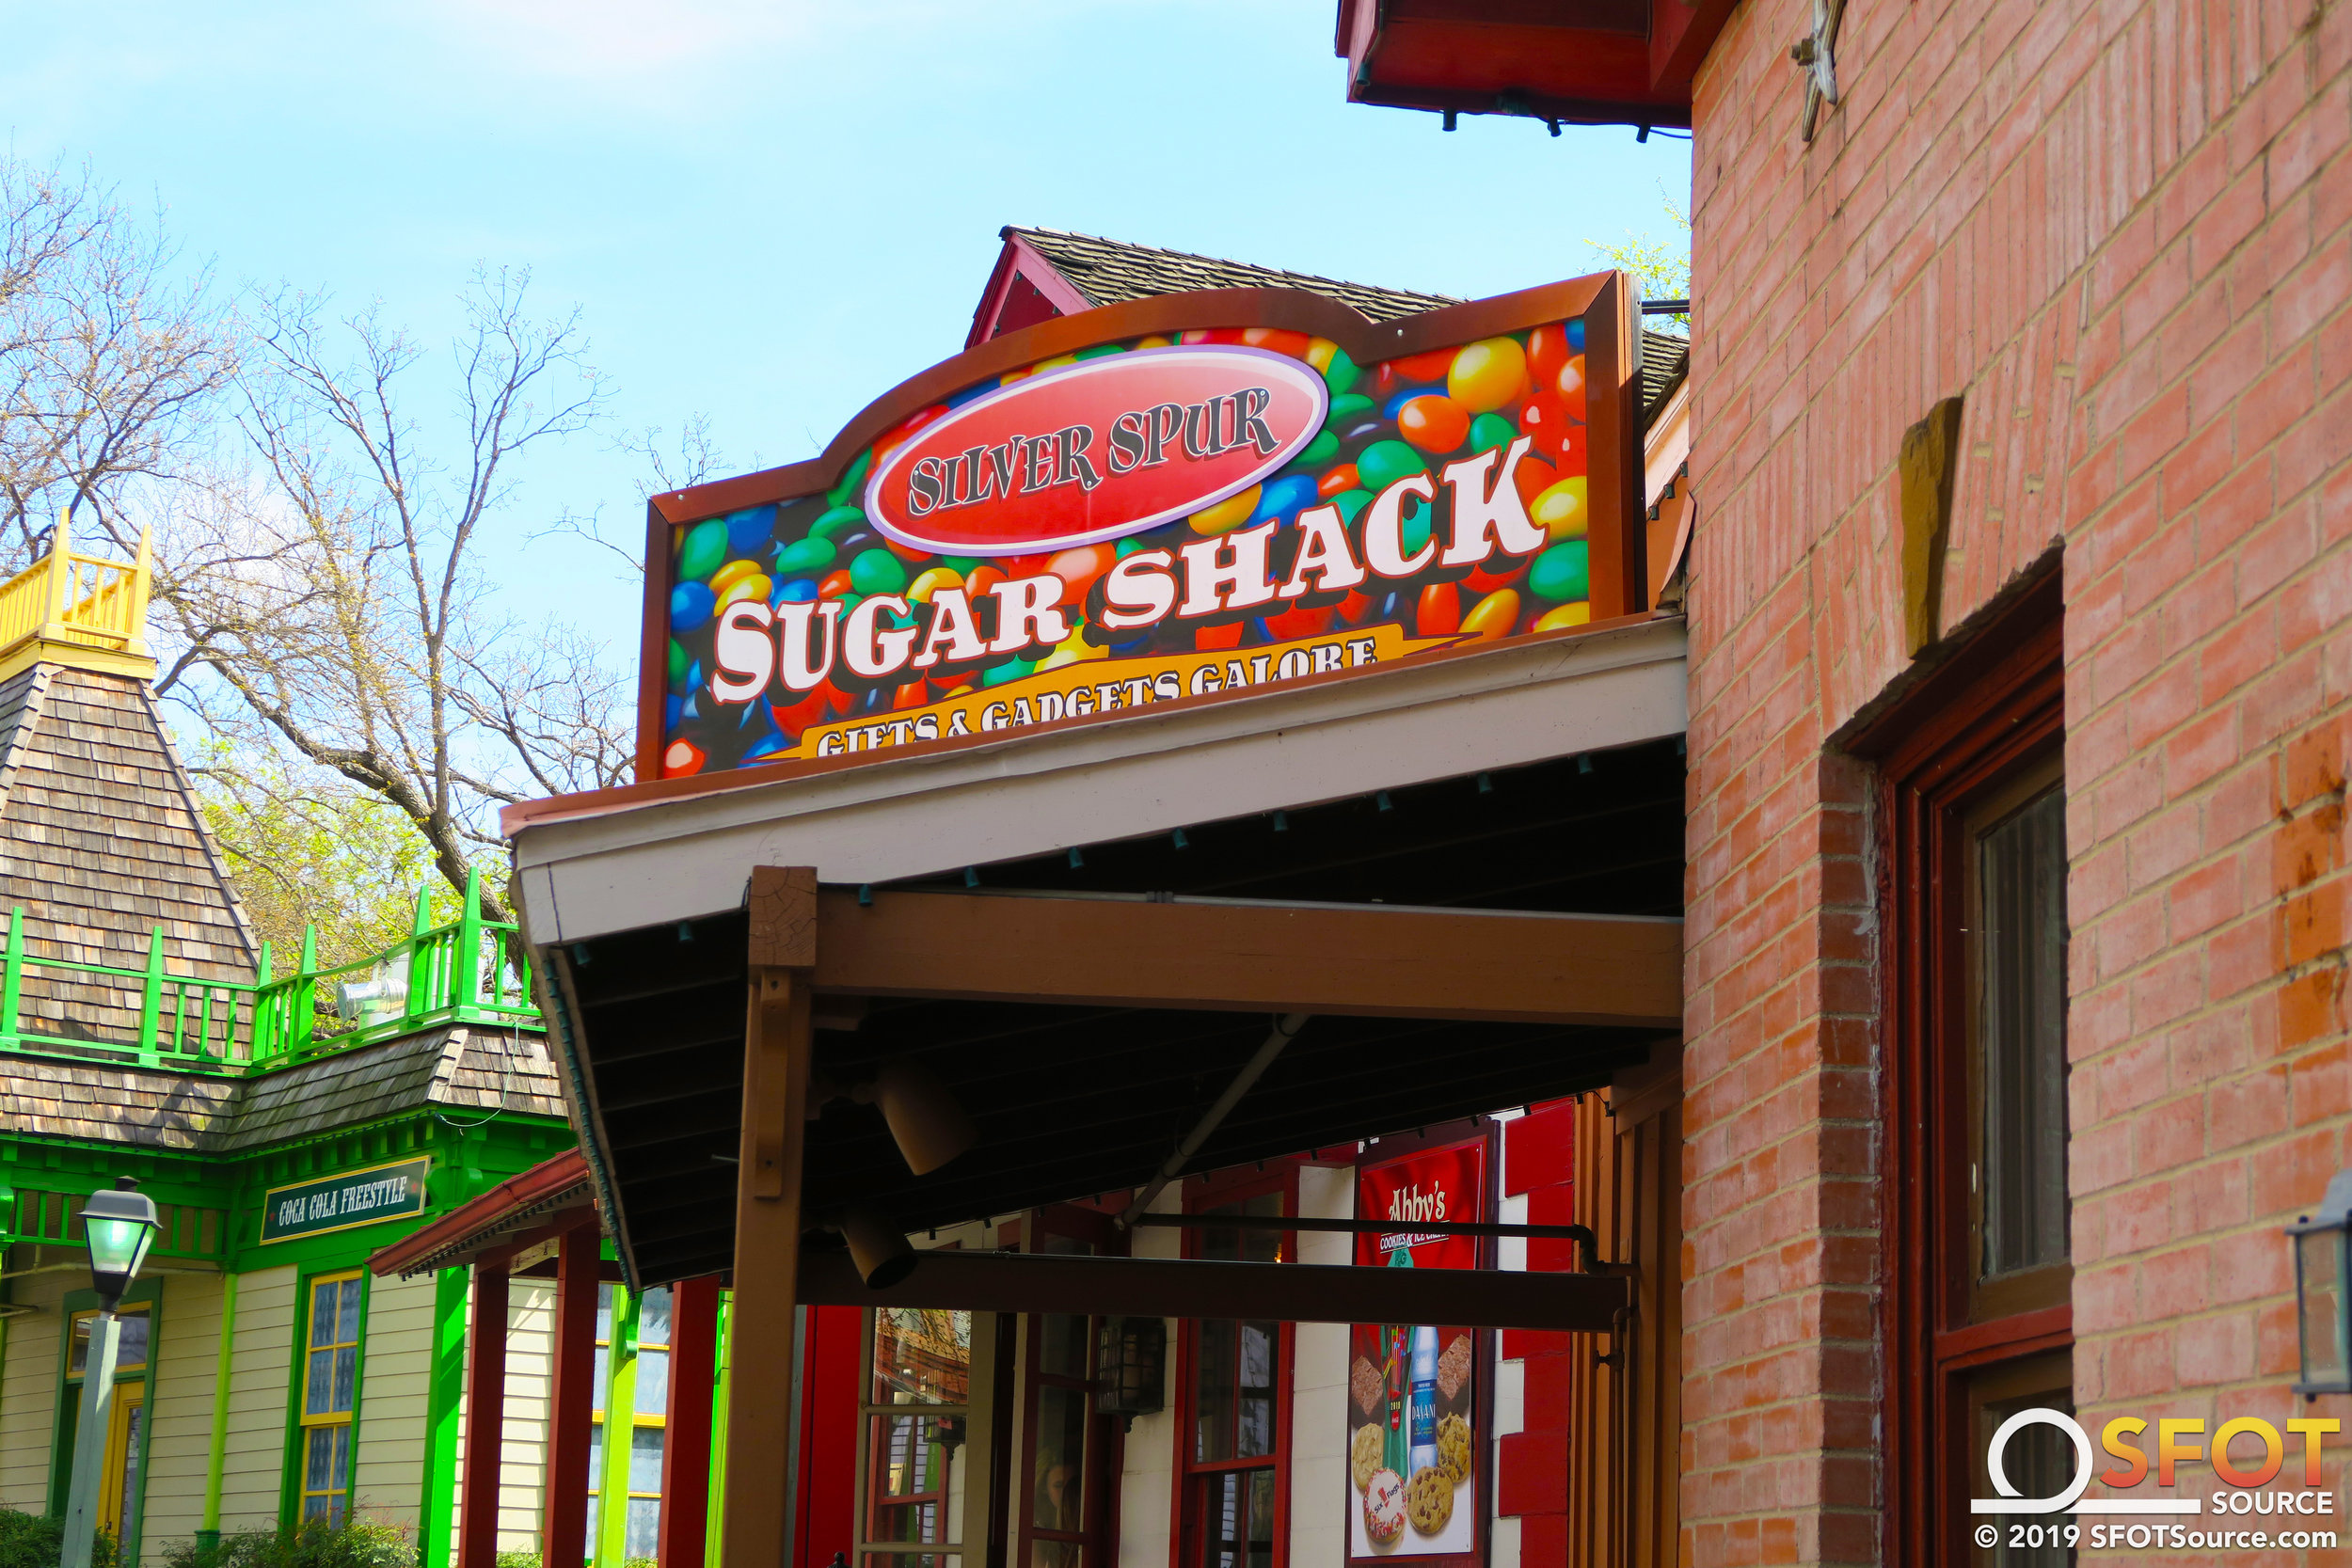 Silver Spur Sugar Shack